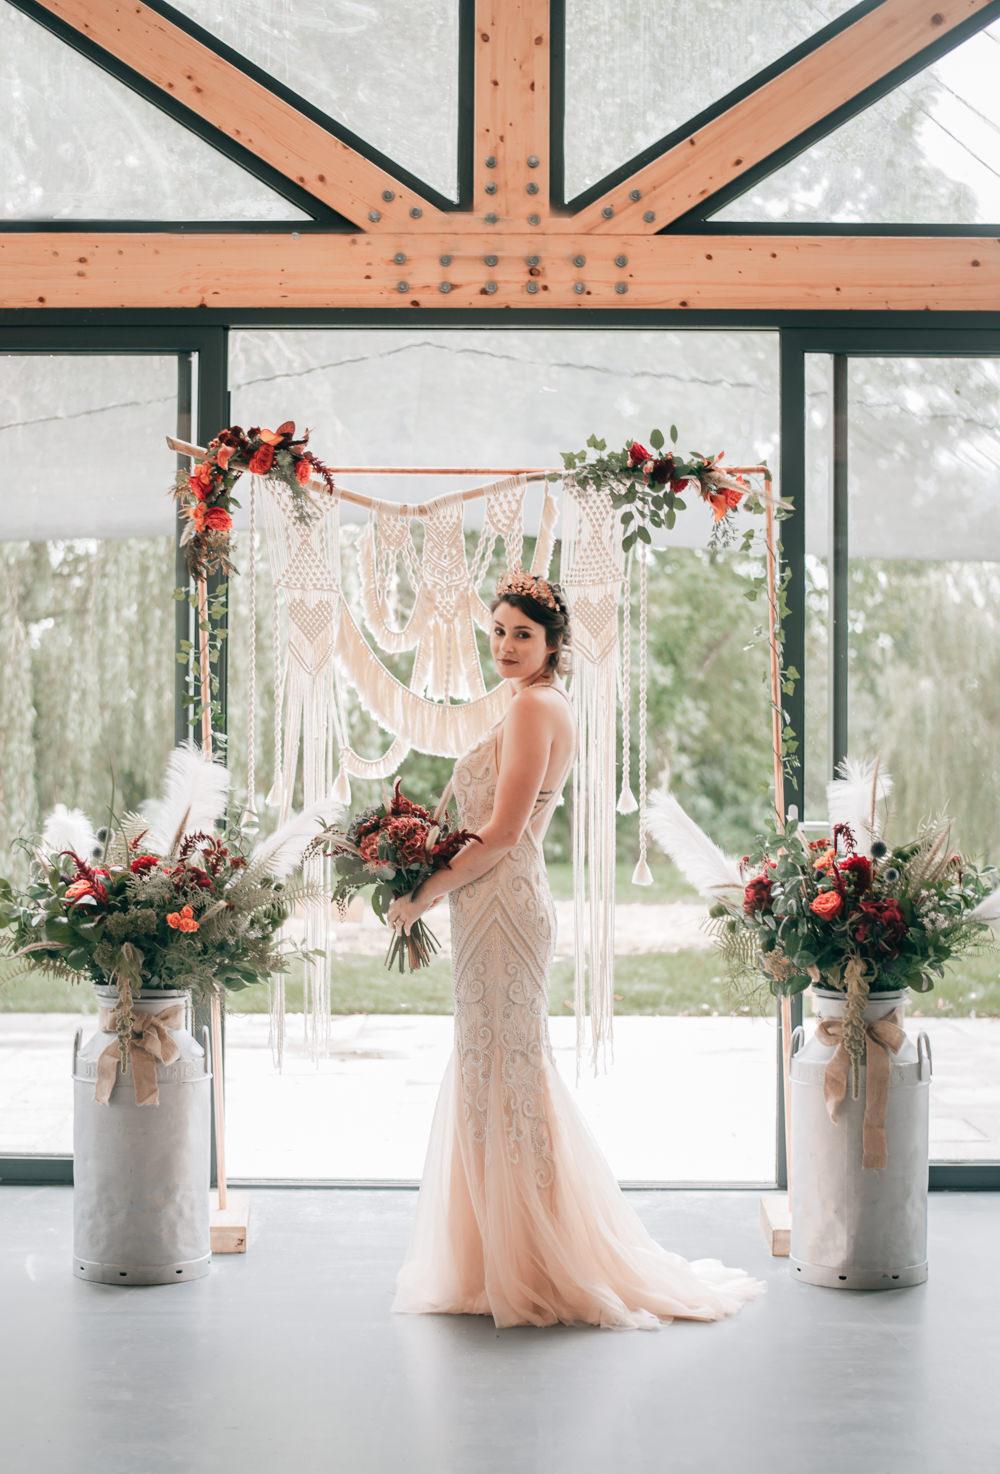 Macrame Flower Arch Backdrop Ceremony Aisle Milk Churn Flowers Eco Friendly Wedding Inspiration Sarah Jayne Photography